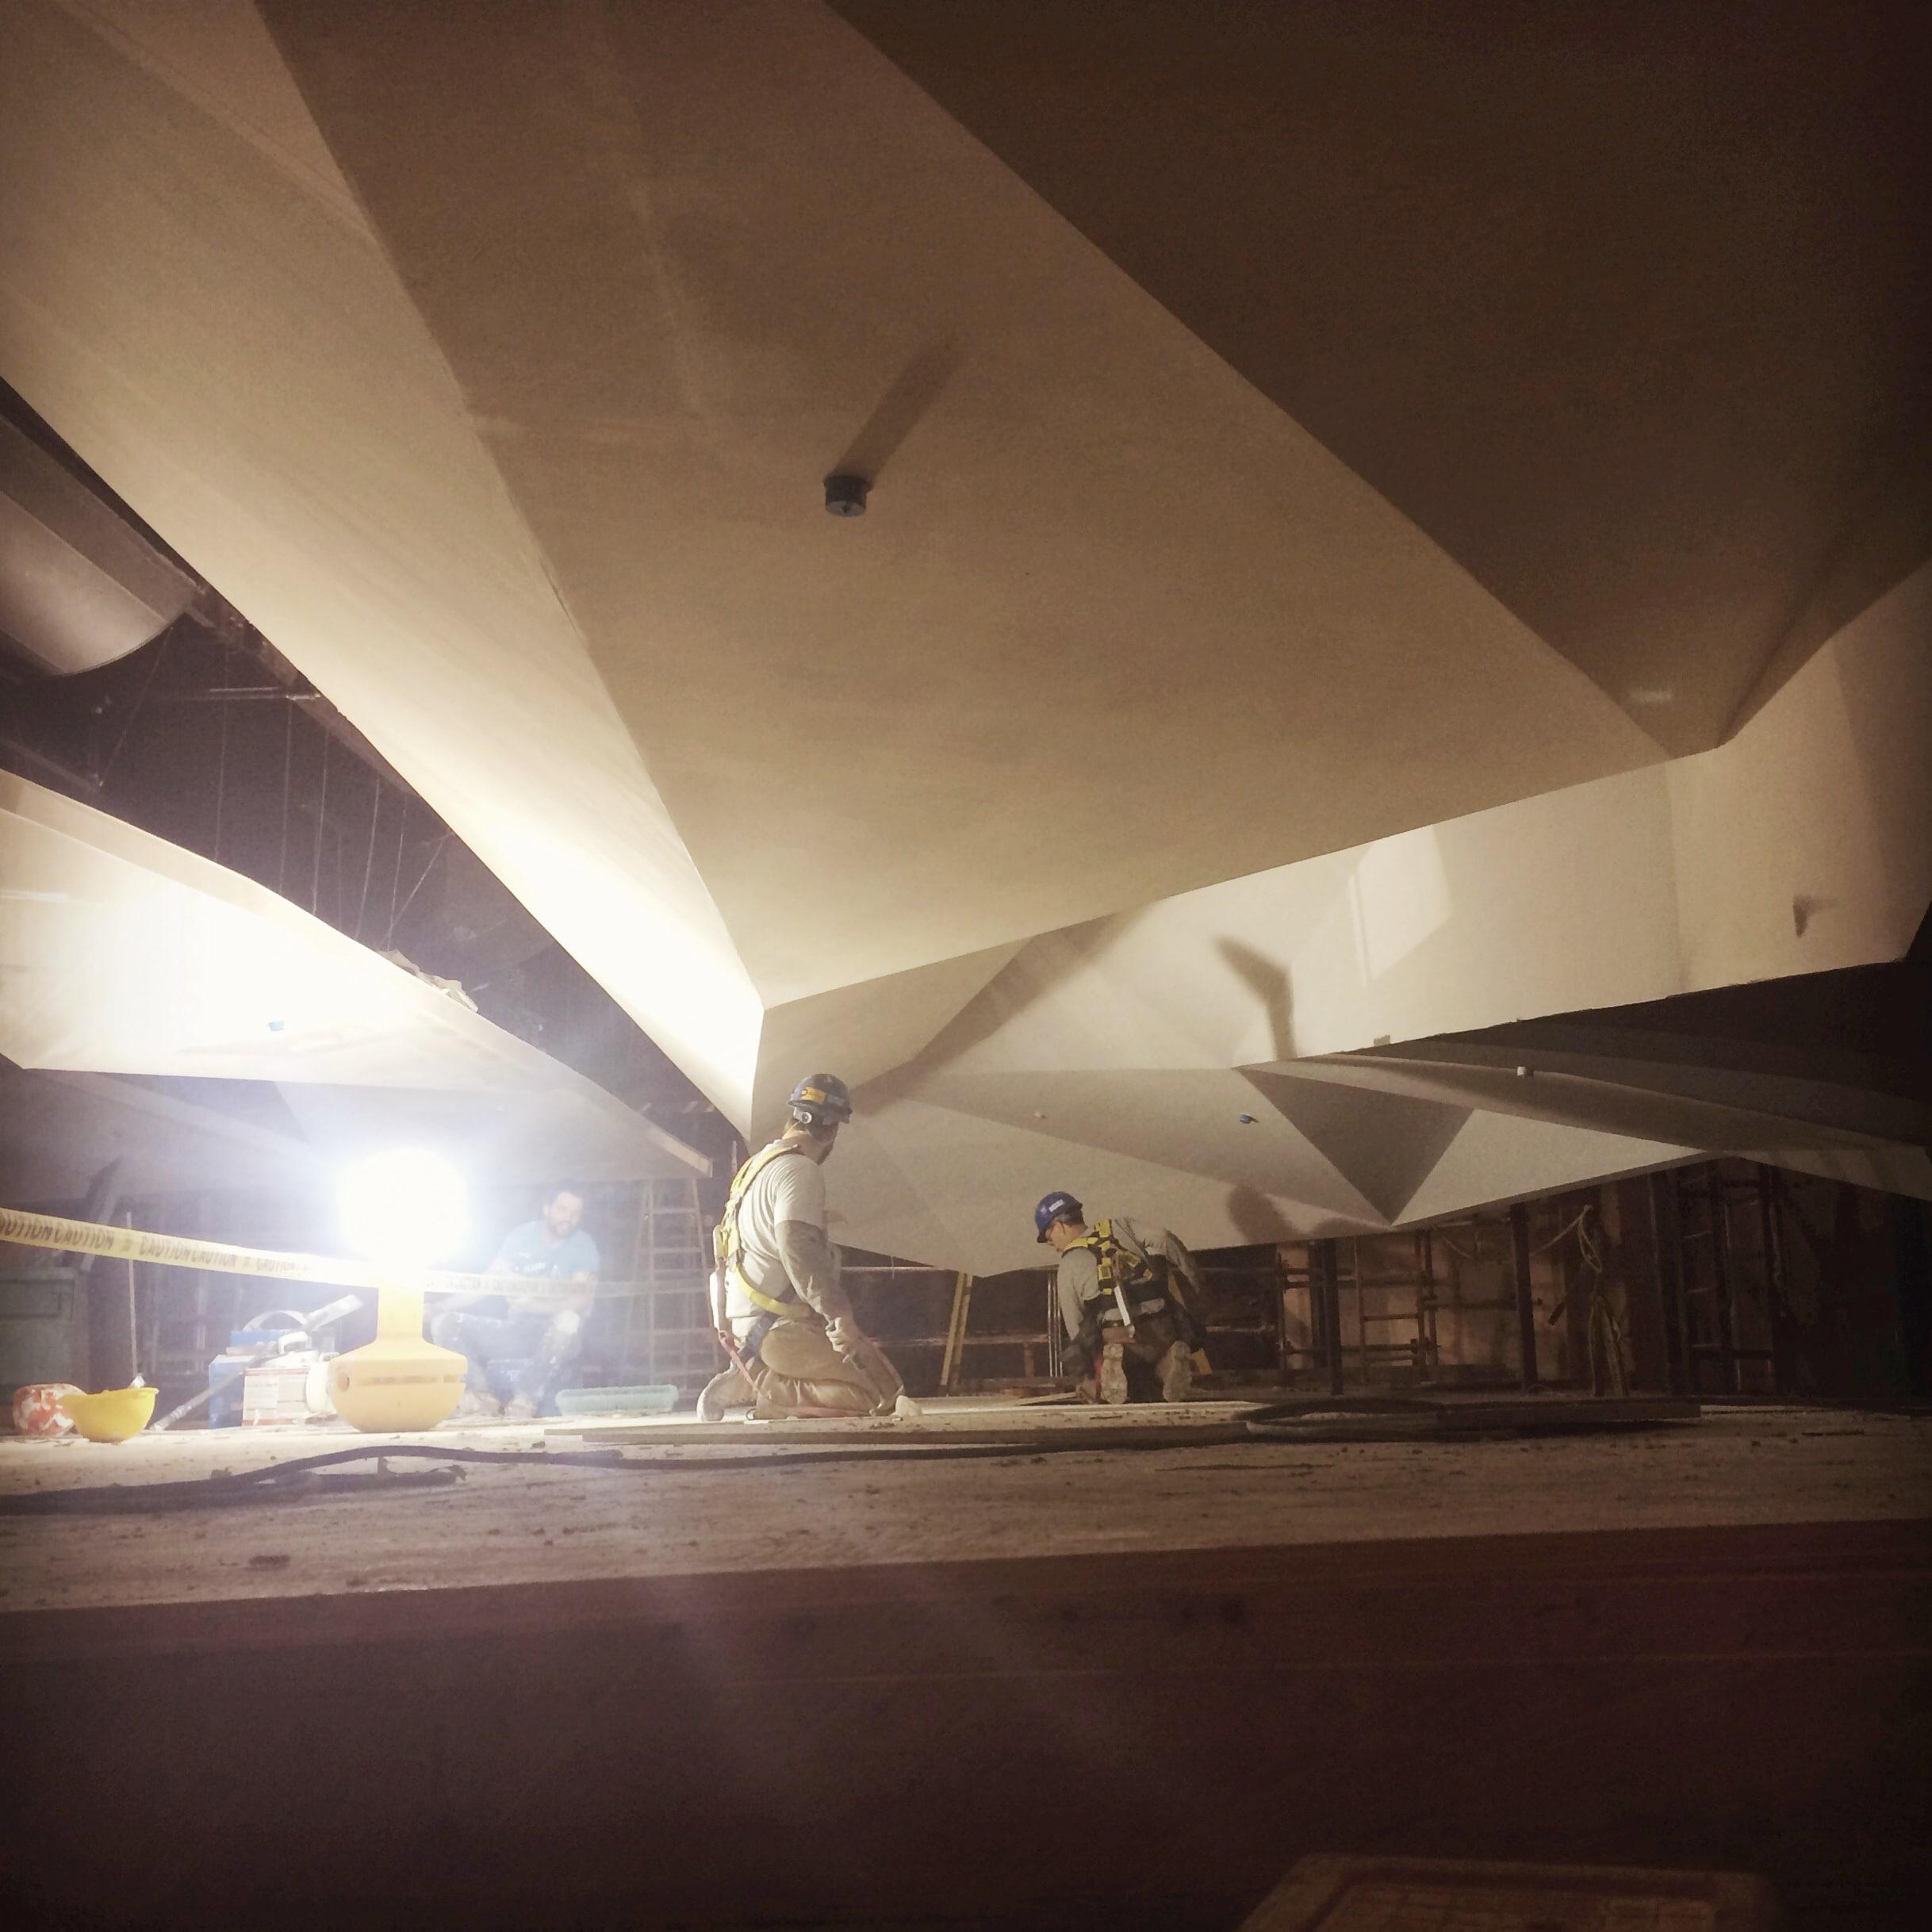 Acoustic Ceiling Panel Construction